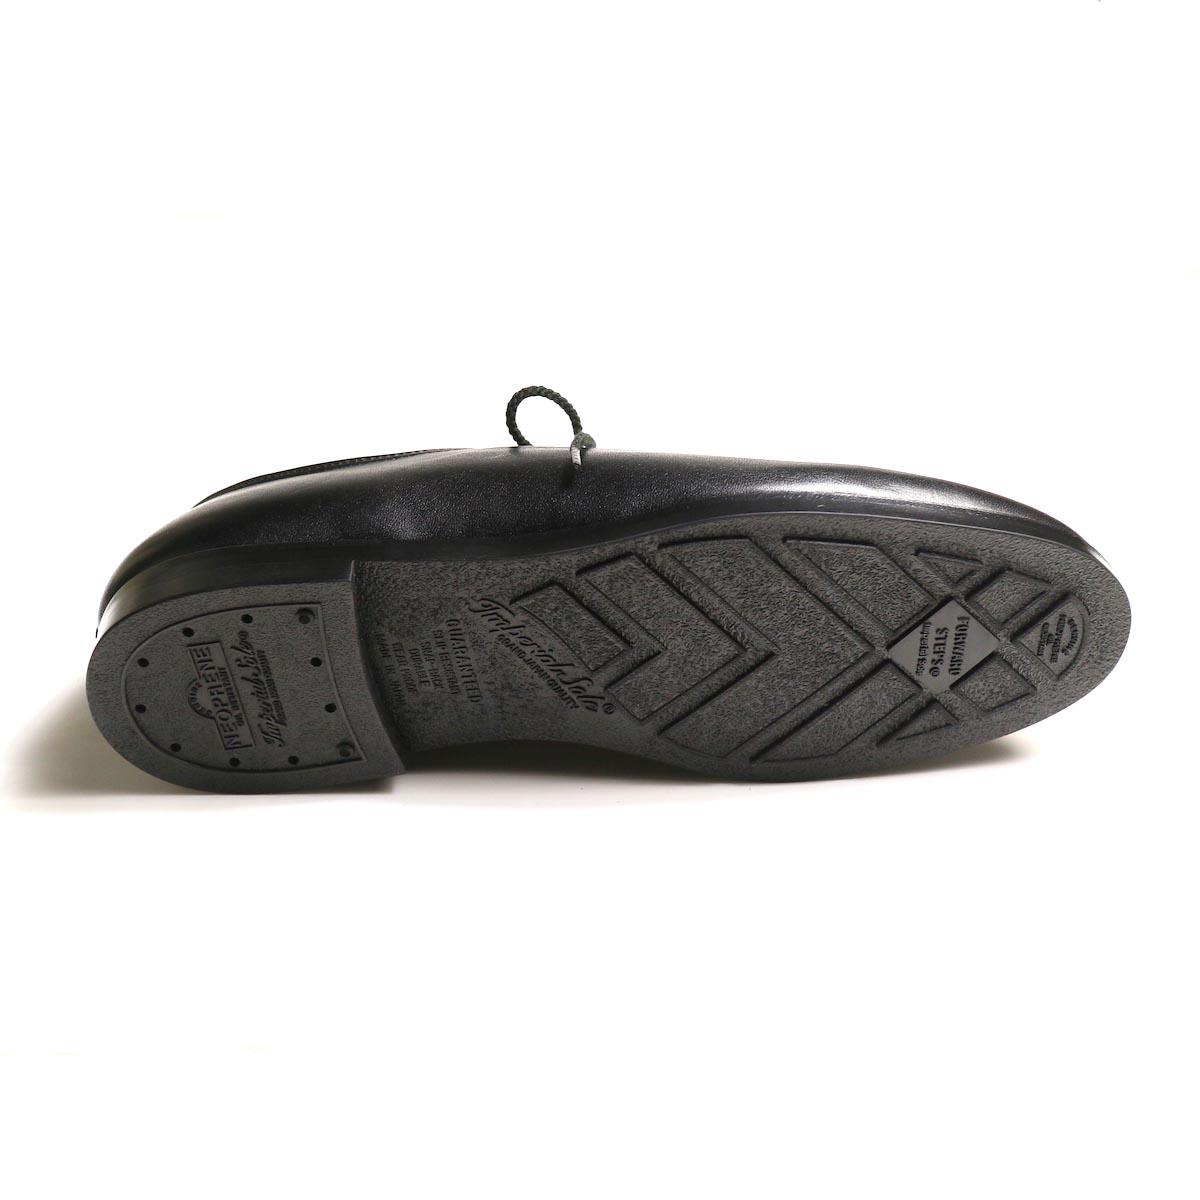 FOOTSTOCK ORIGINALS / ONE PIECE (Black)  IMPERIAL SOLE